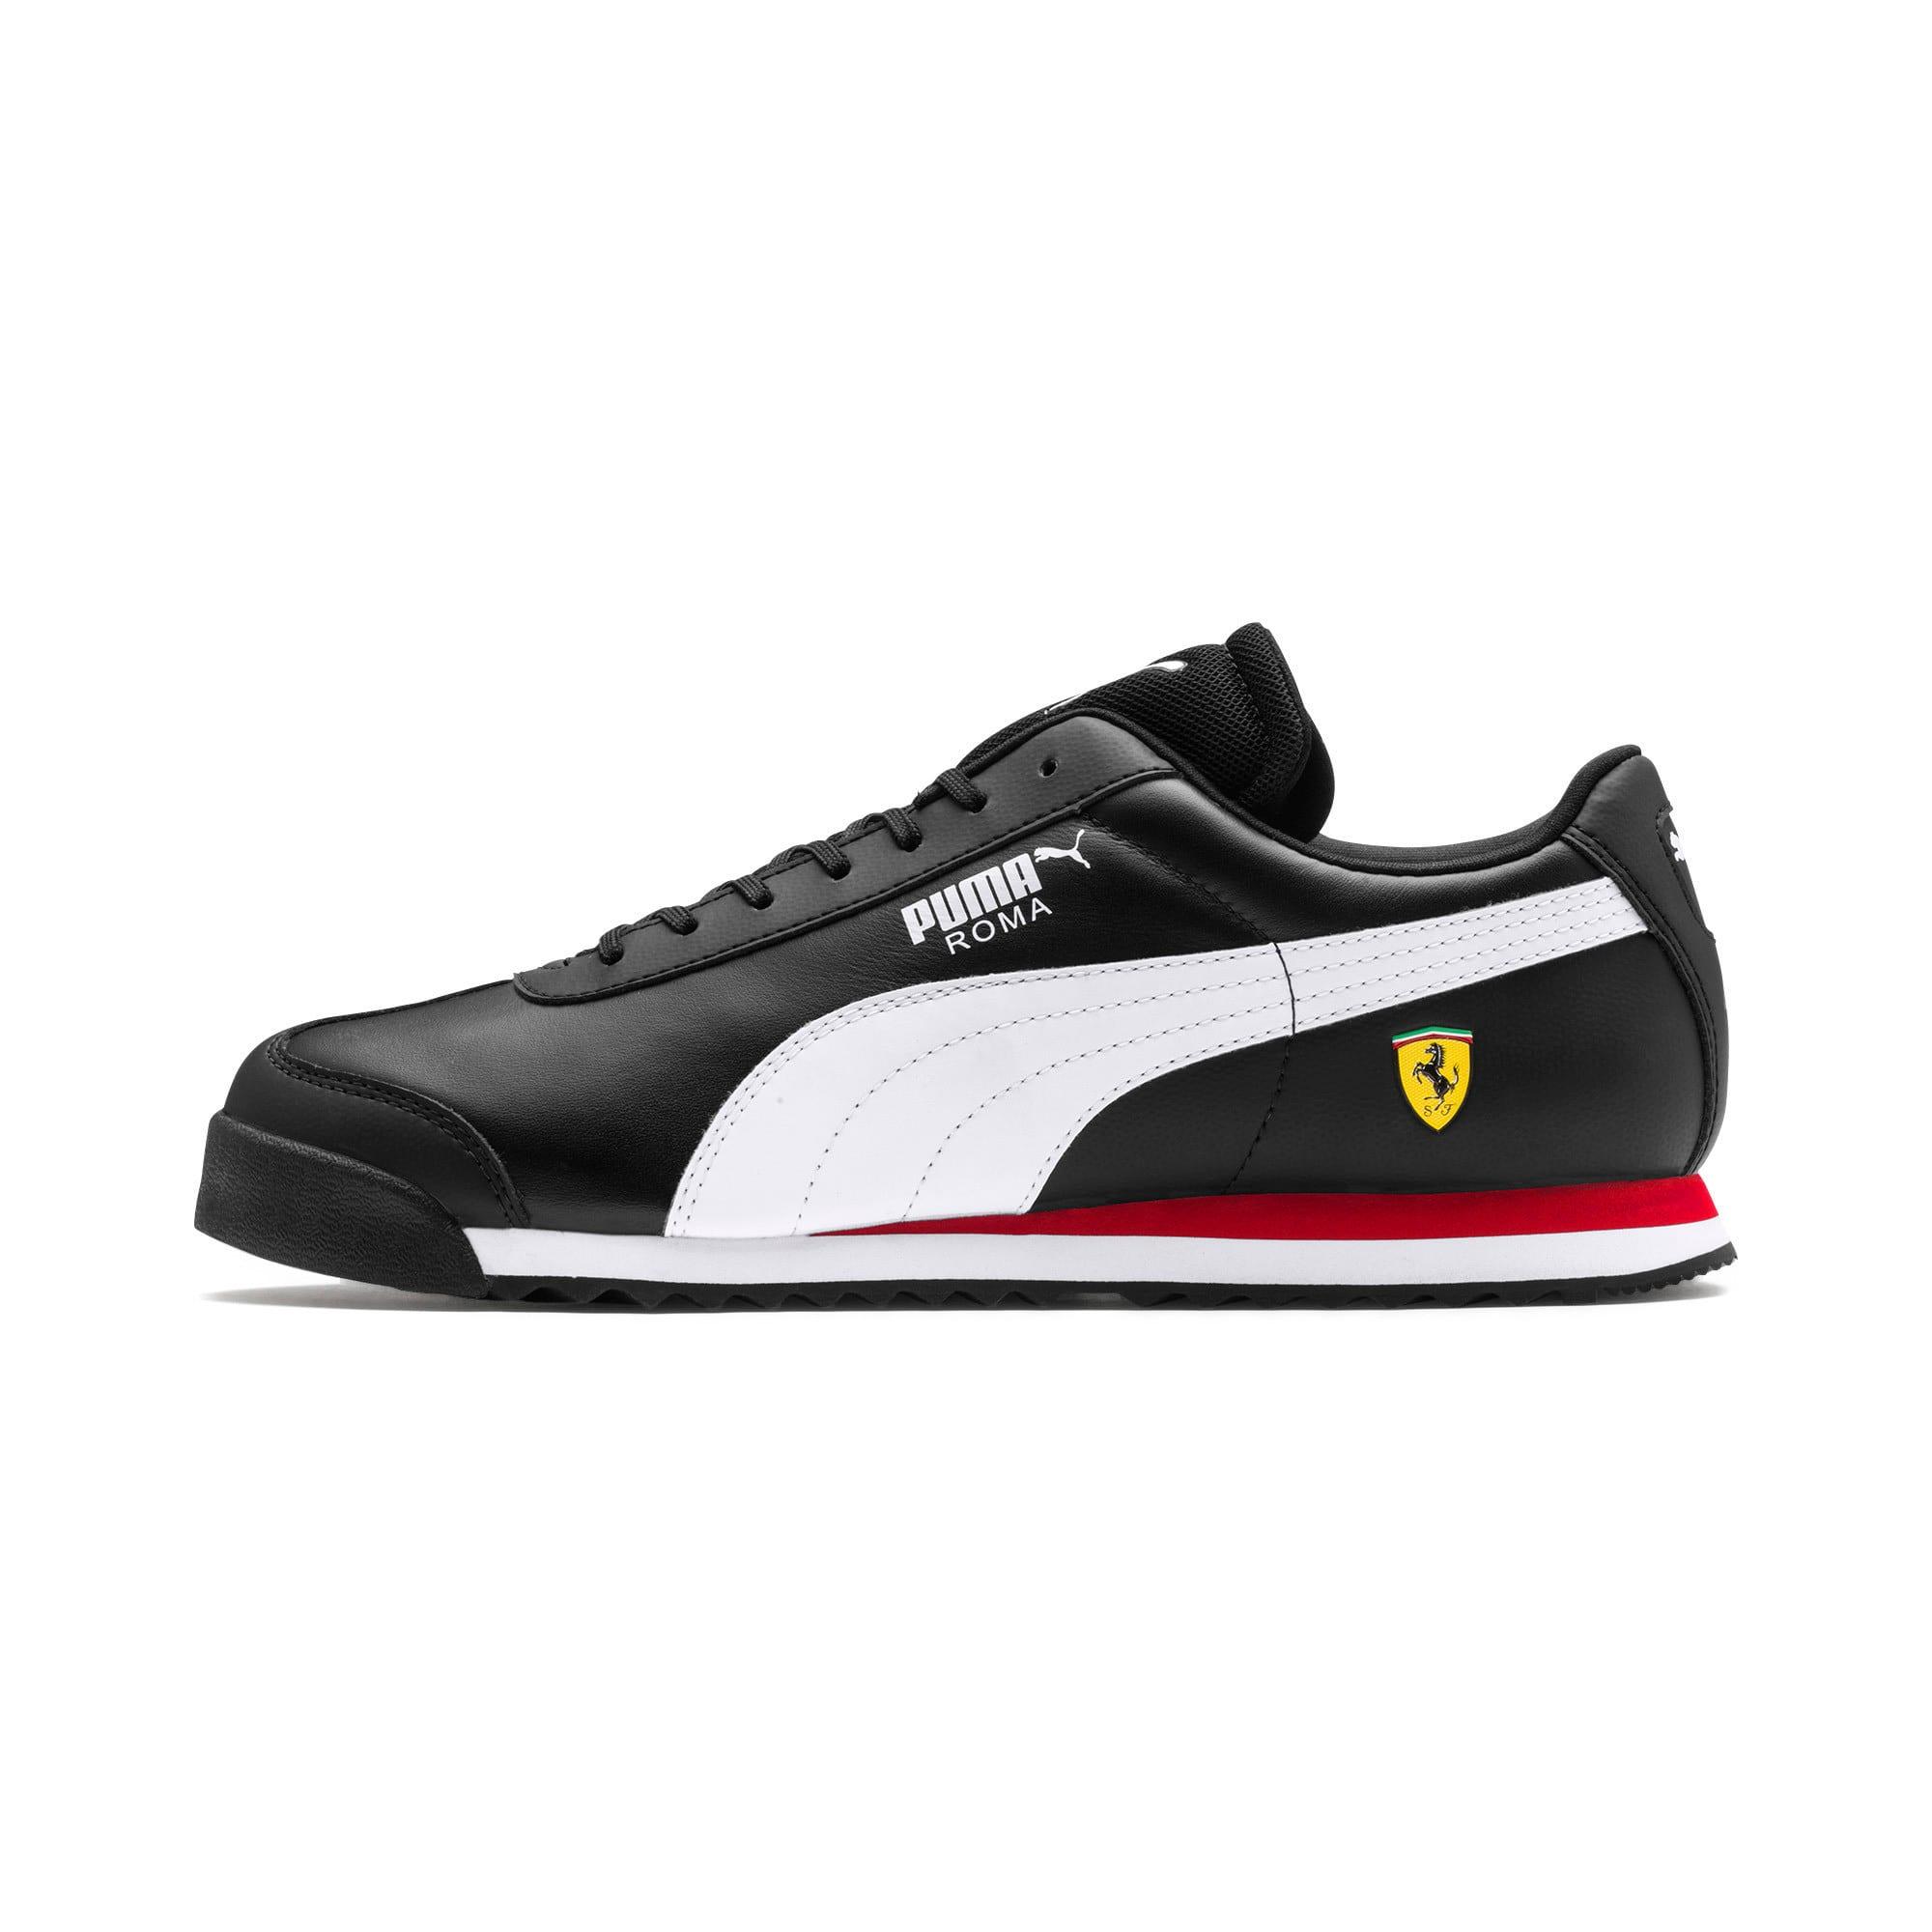 Thumbnail 1 of Scuderia Ferrari Roma Men's Sneakers, Black-White-Rosso Corsa, medium